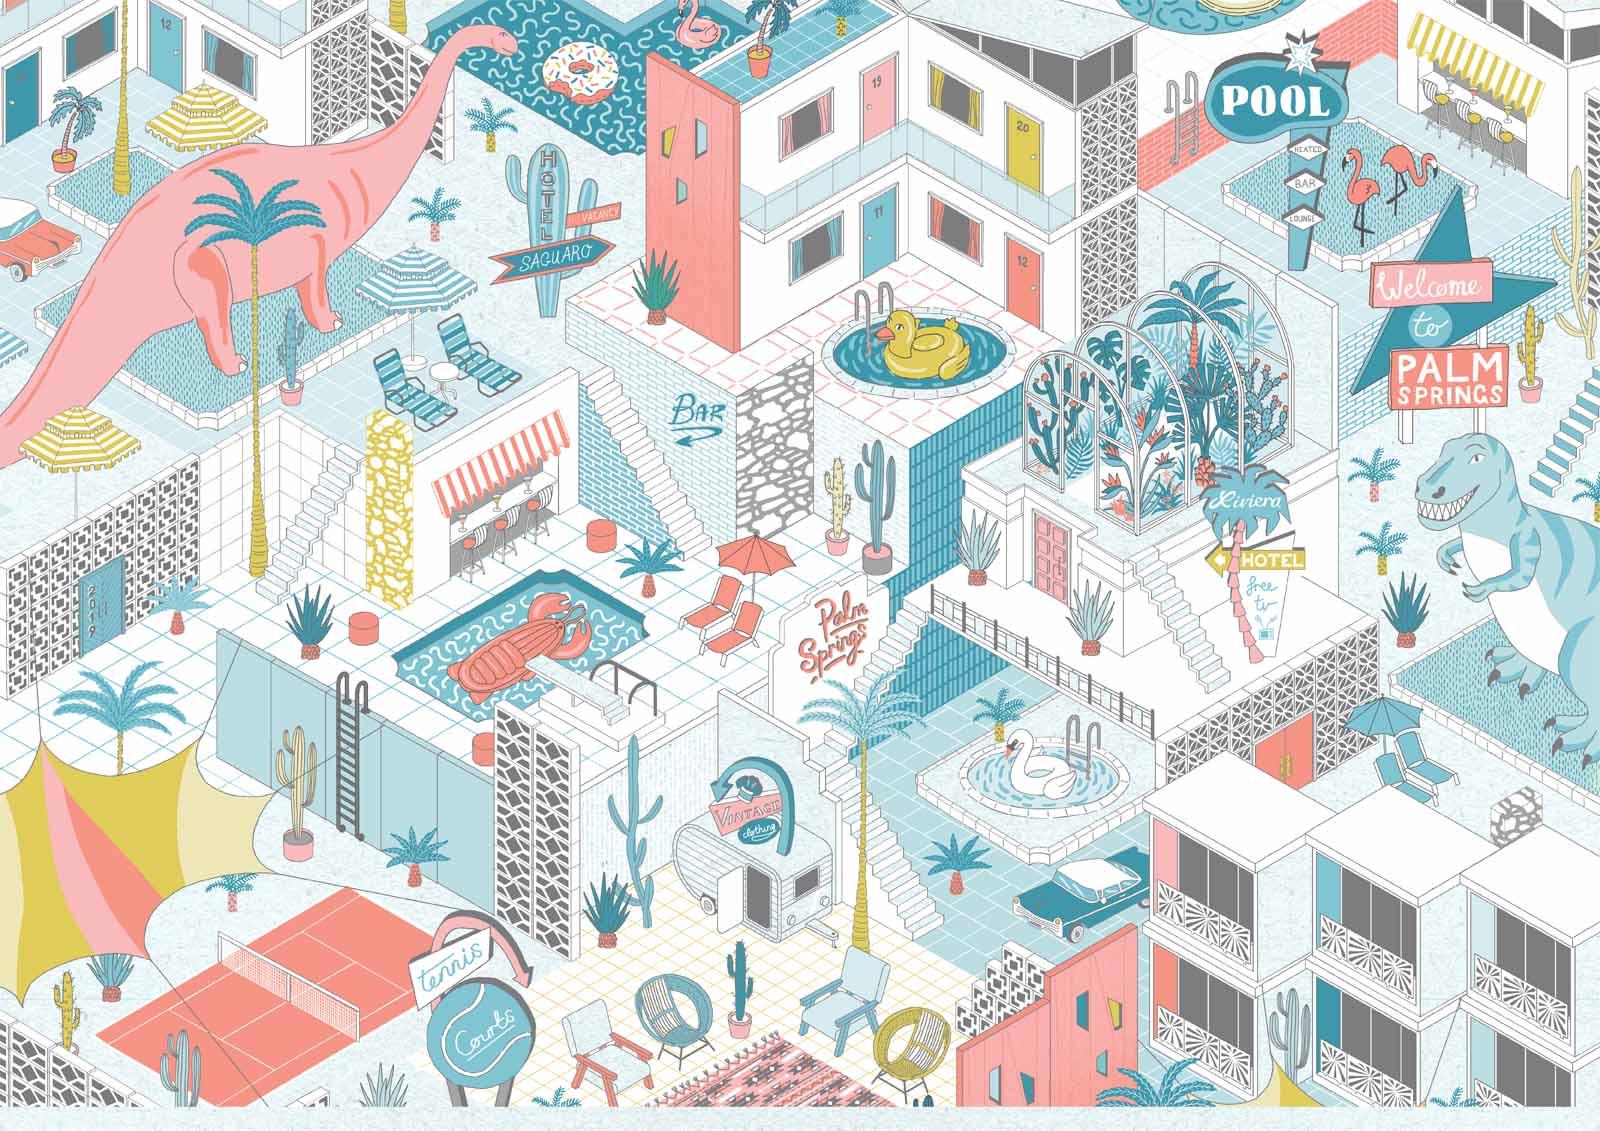 Splash-House-Music-Festival-June-Pattern-By-Jacqueline-Colley-1.jpg